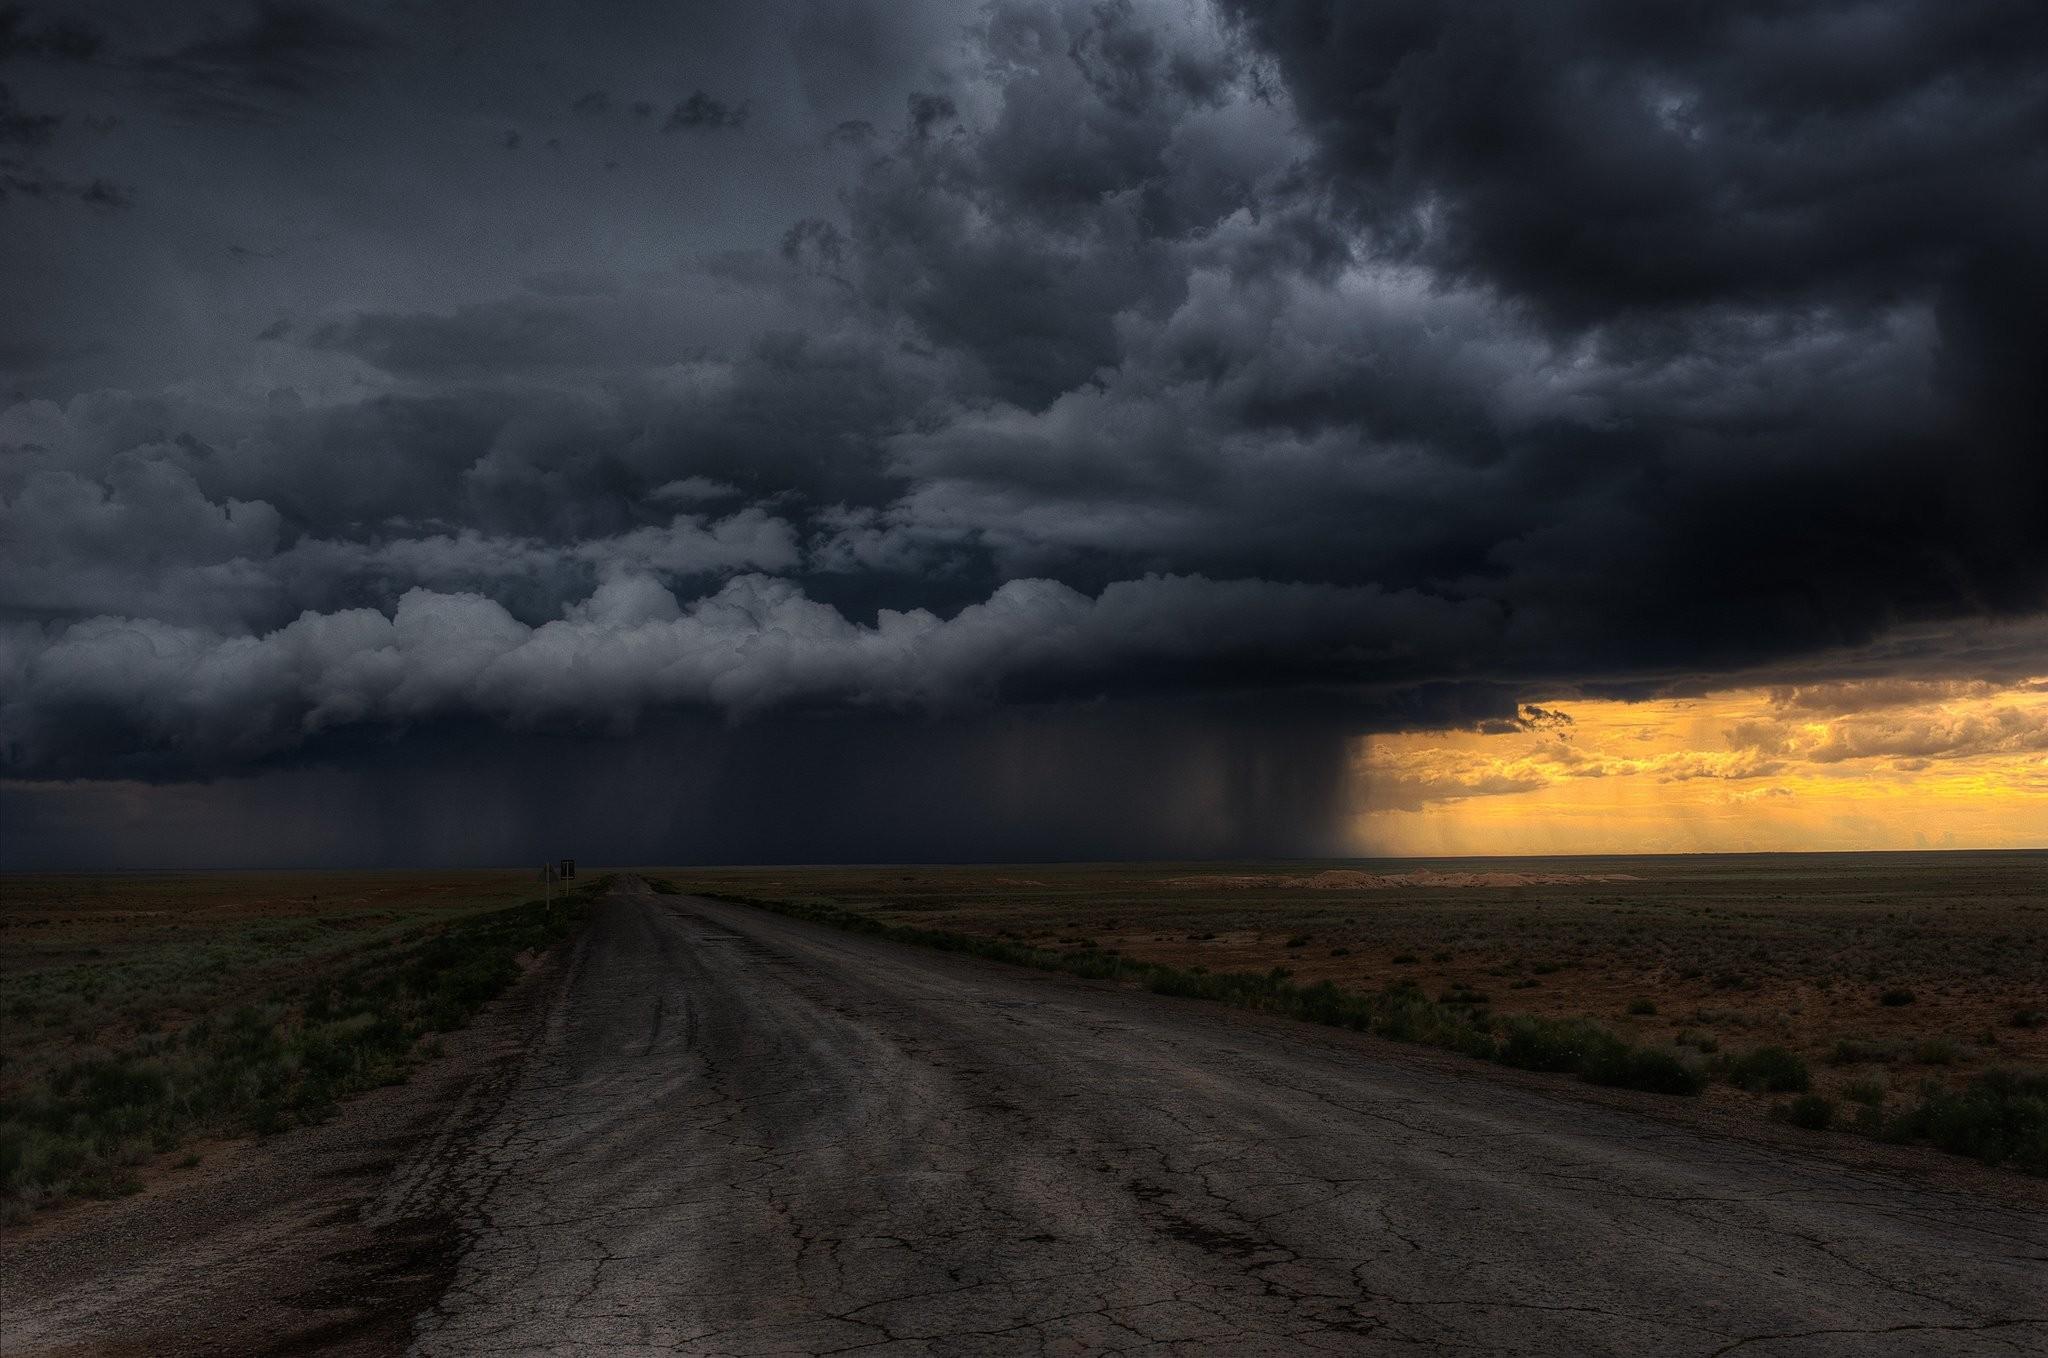 Road clouds field storm rain sky wallpaper | | 364872 .